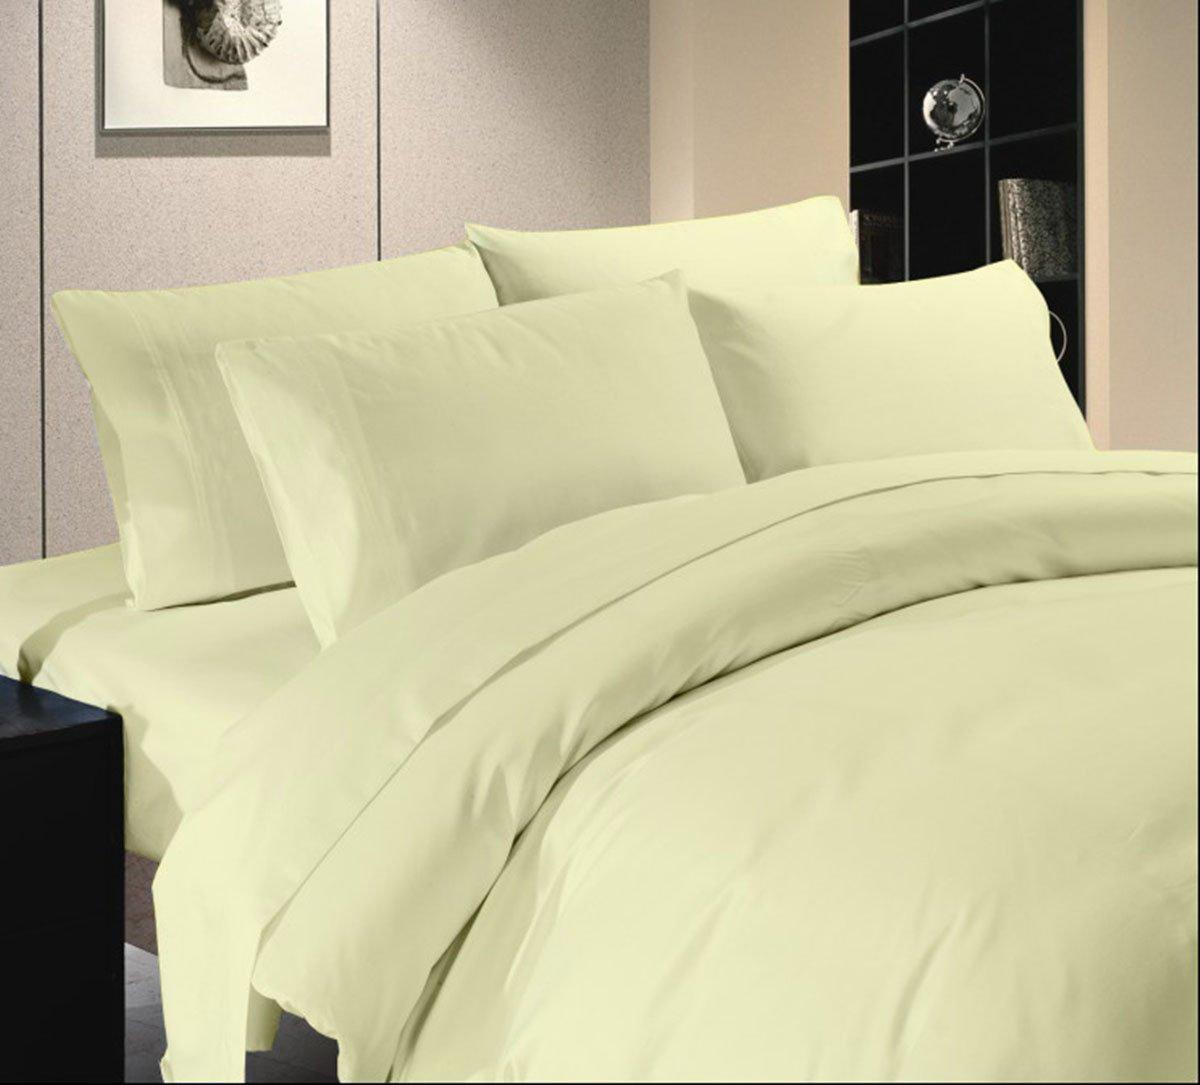 Gracy Bedding Sheet Set OR Duvet Set Egyptian Cotton US King Size Striped Colors